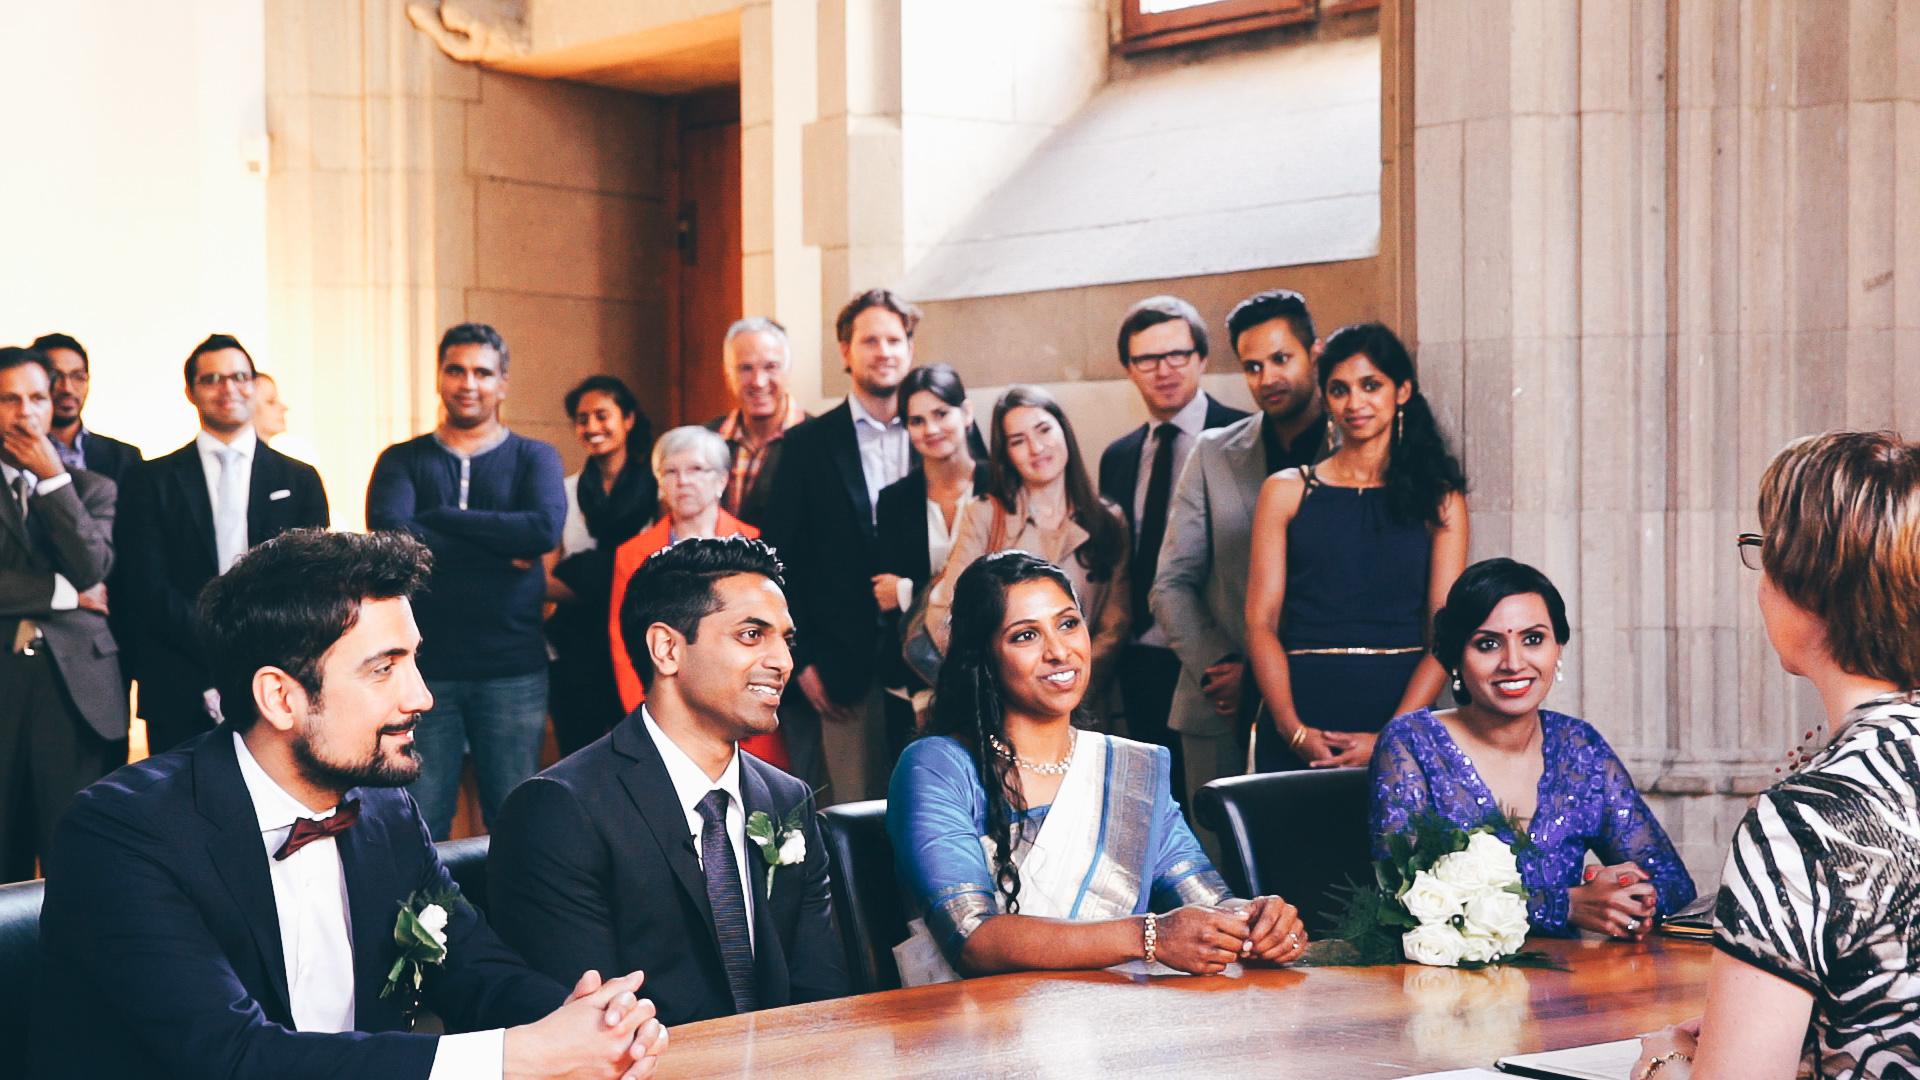 Hochzeitsfilm St Pantaleon Balloni Standesamt Koln Historisches